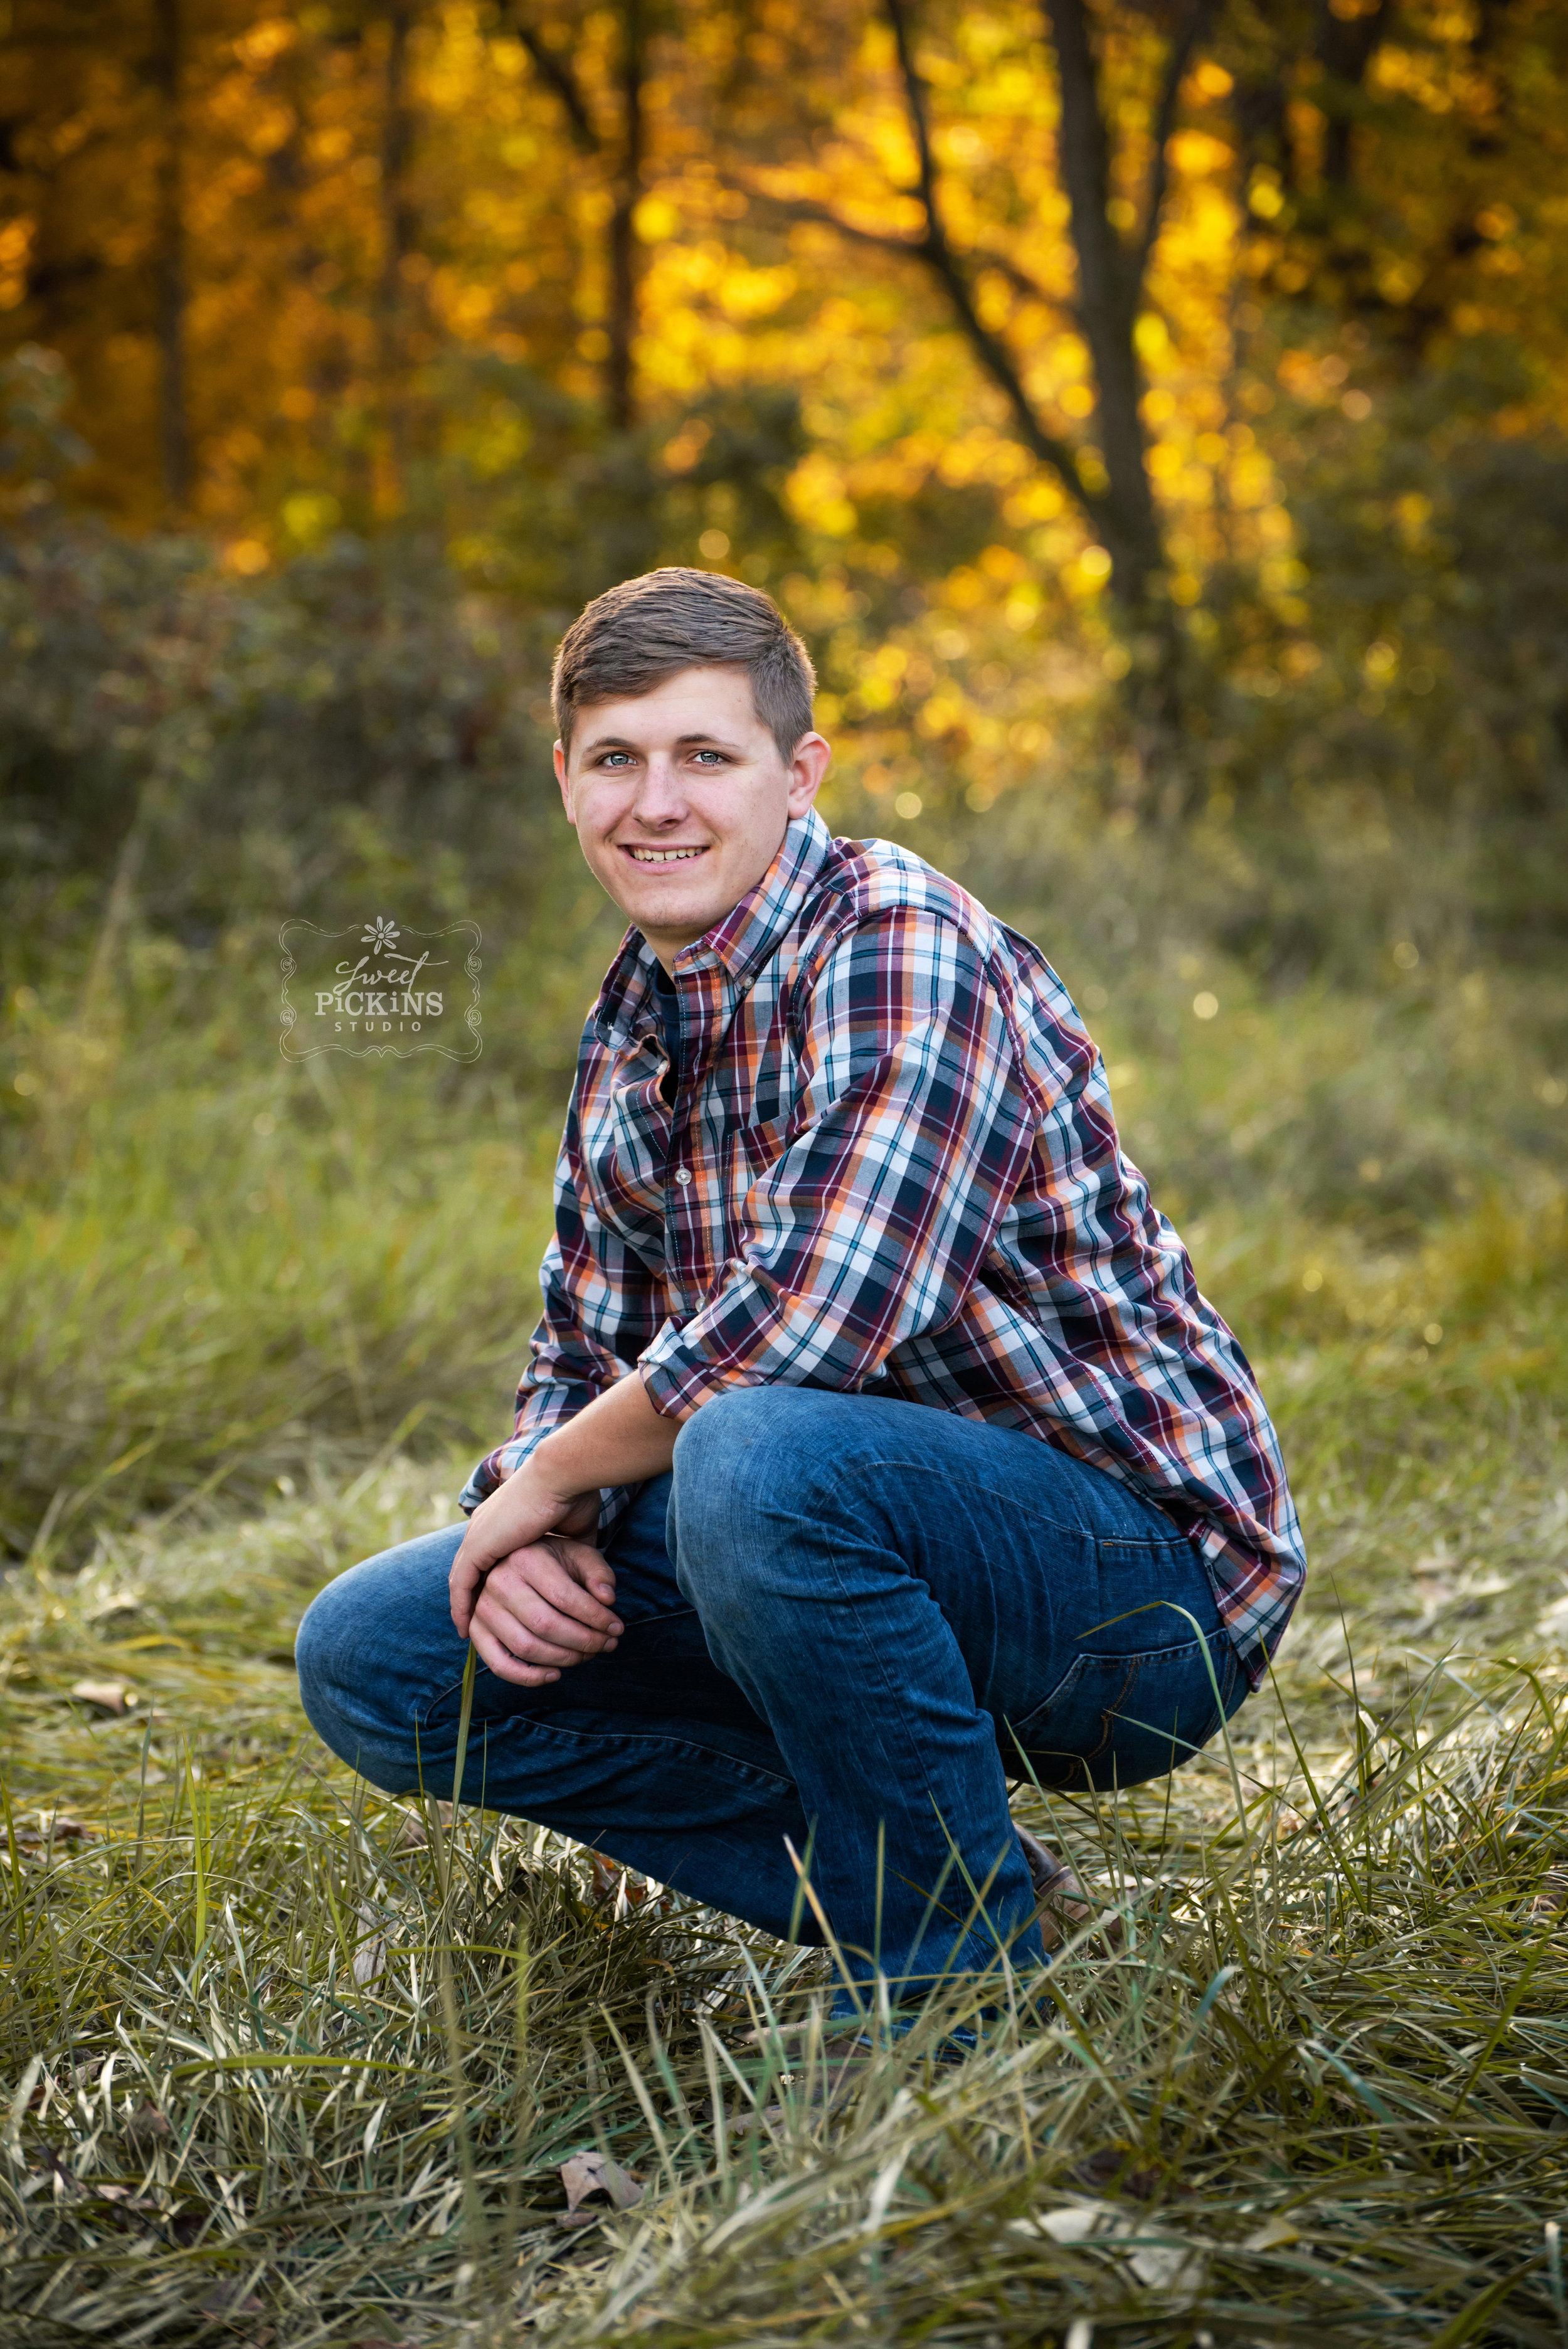 Senior Portrait Photography | Outdoor Fall Senior Posing